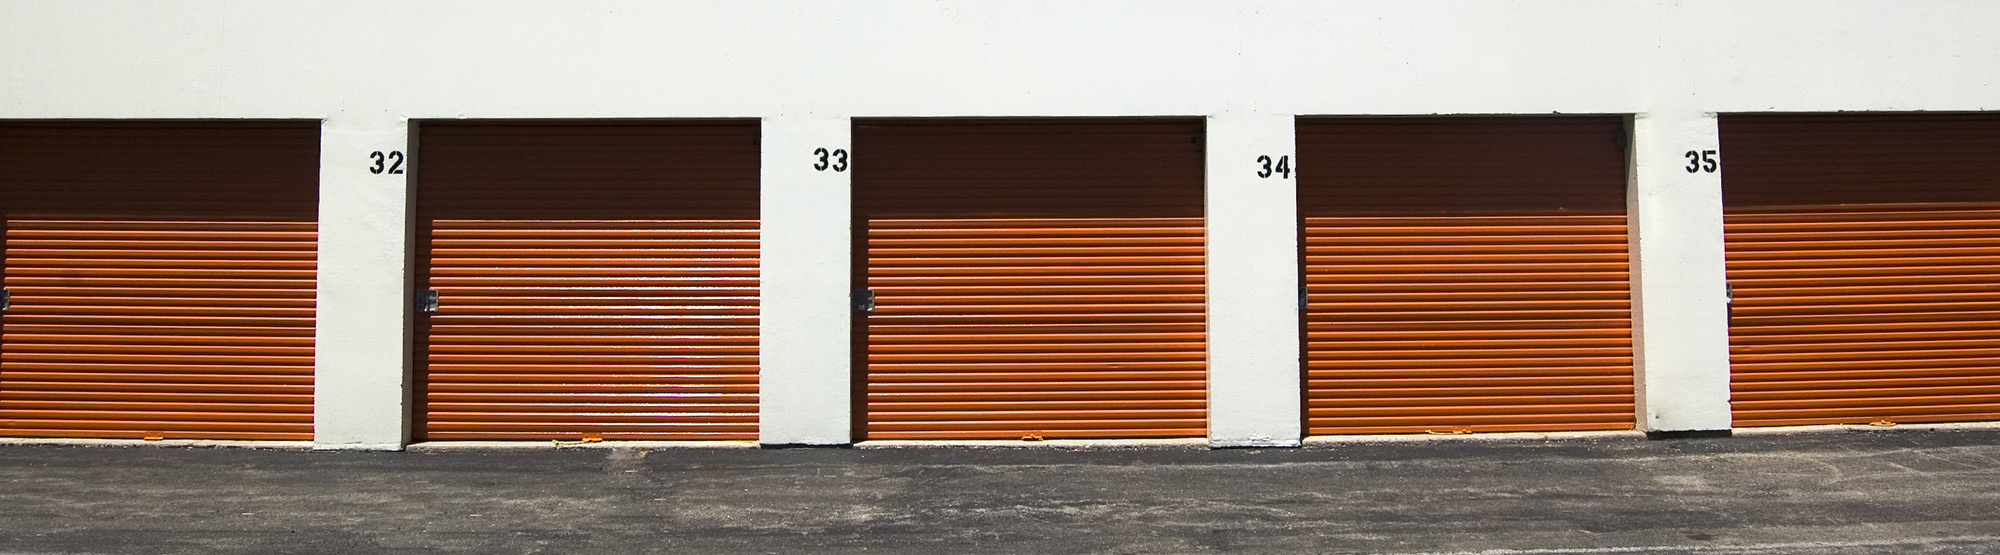 Stonegate Storage units in Artesia, NM